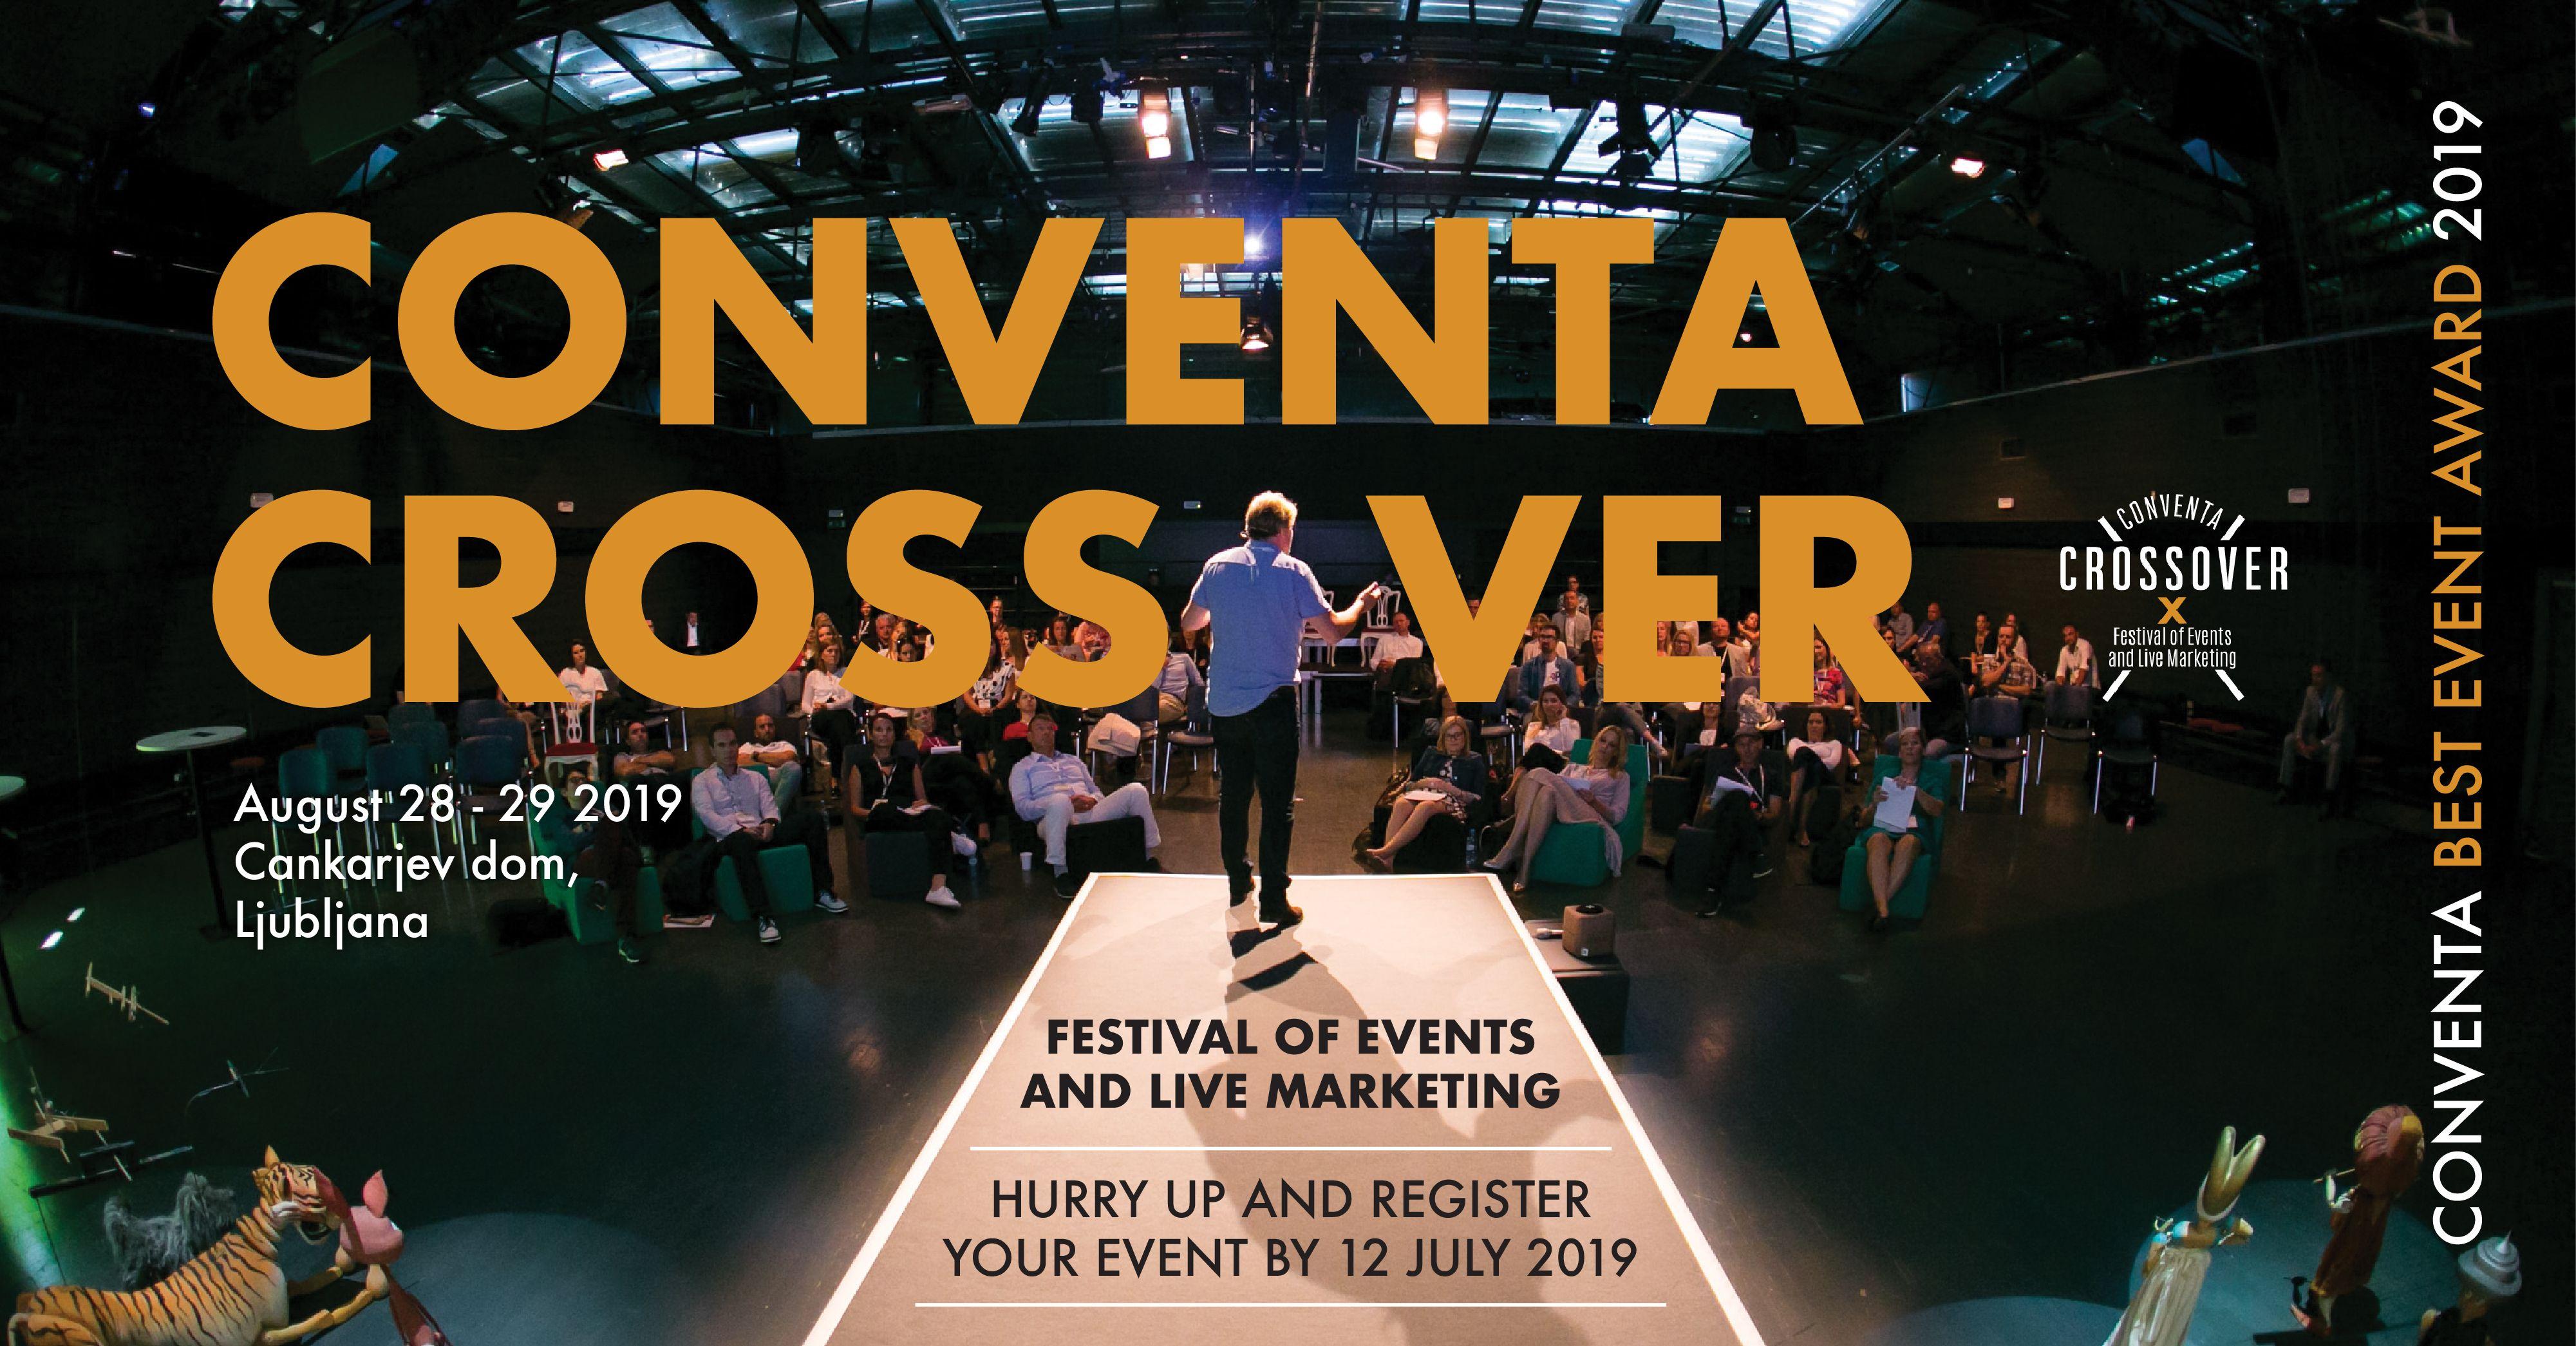 Conventa Crossover 2019 - Website Banner 4000x2089px (2)